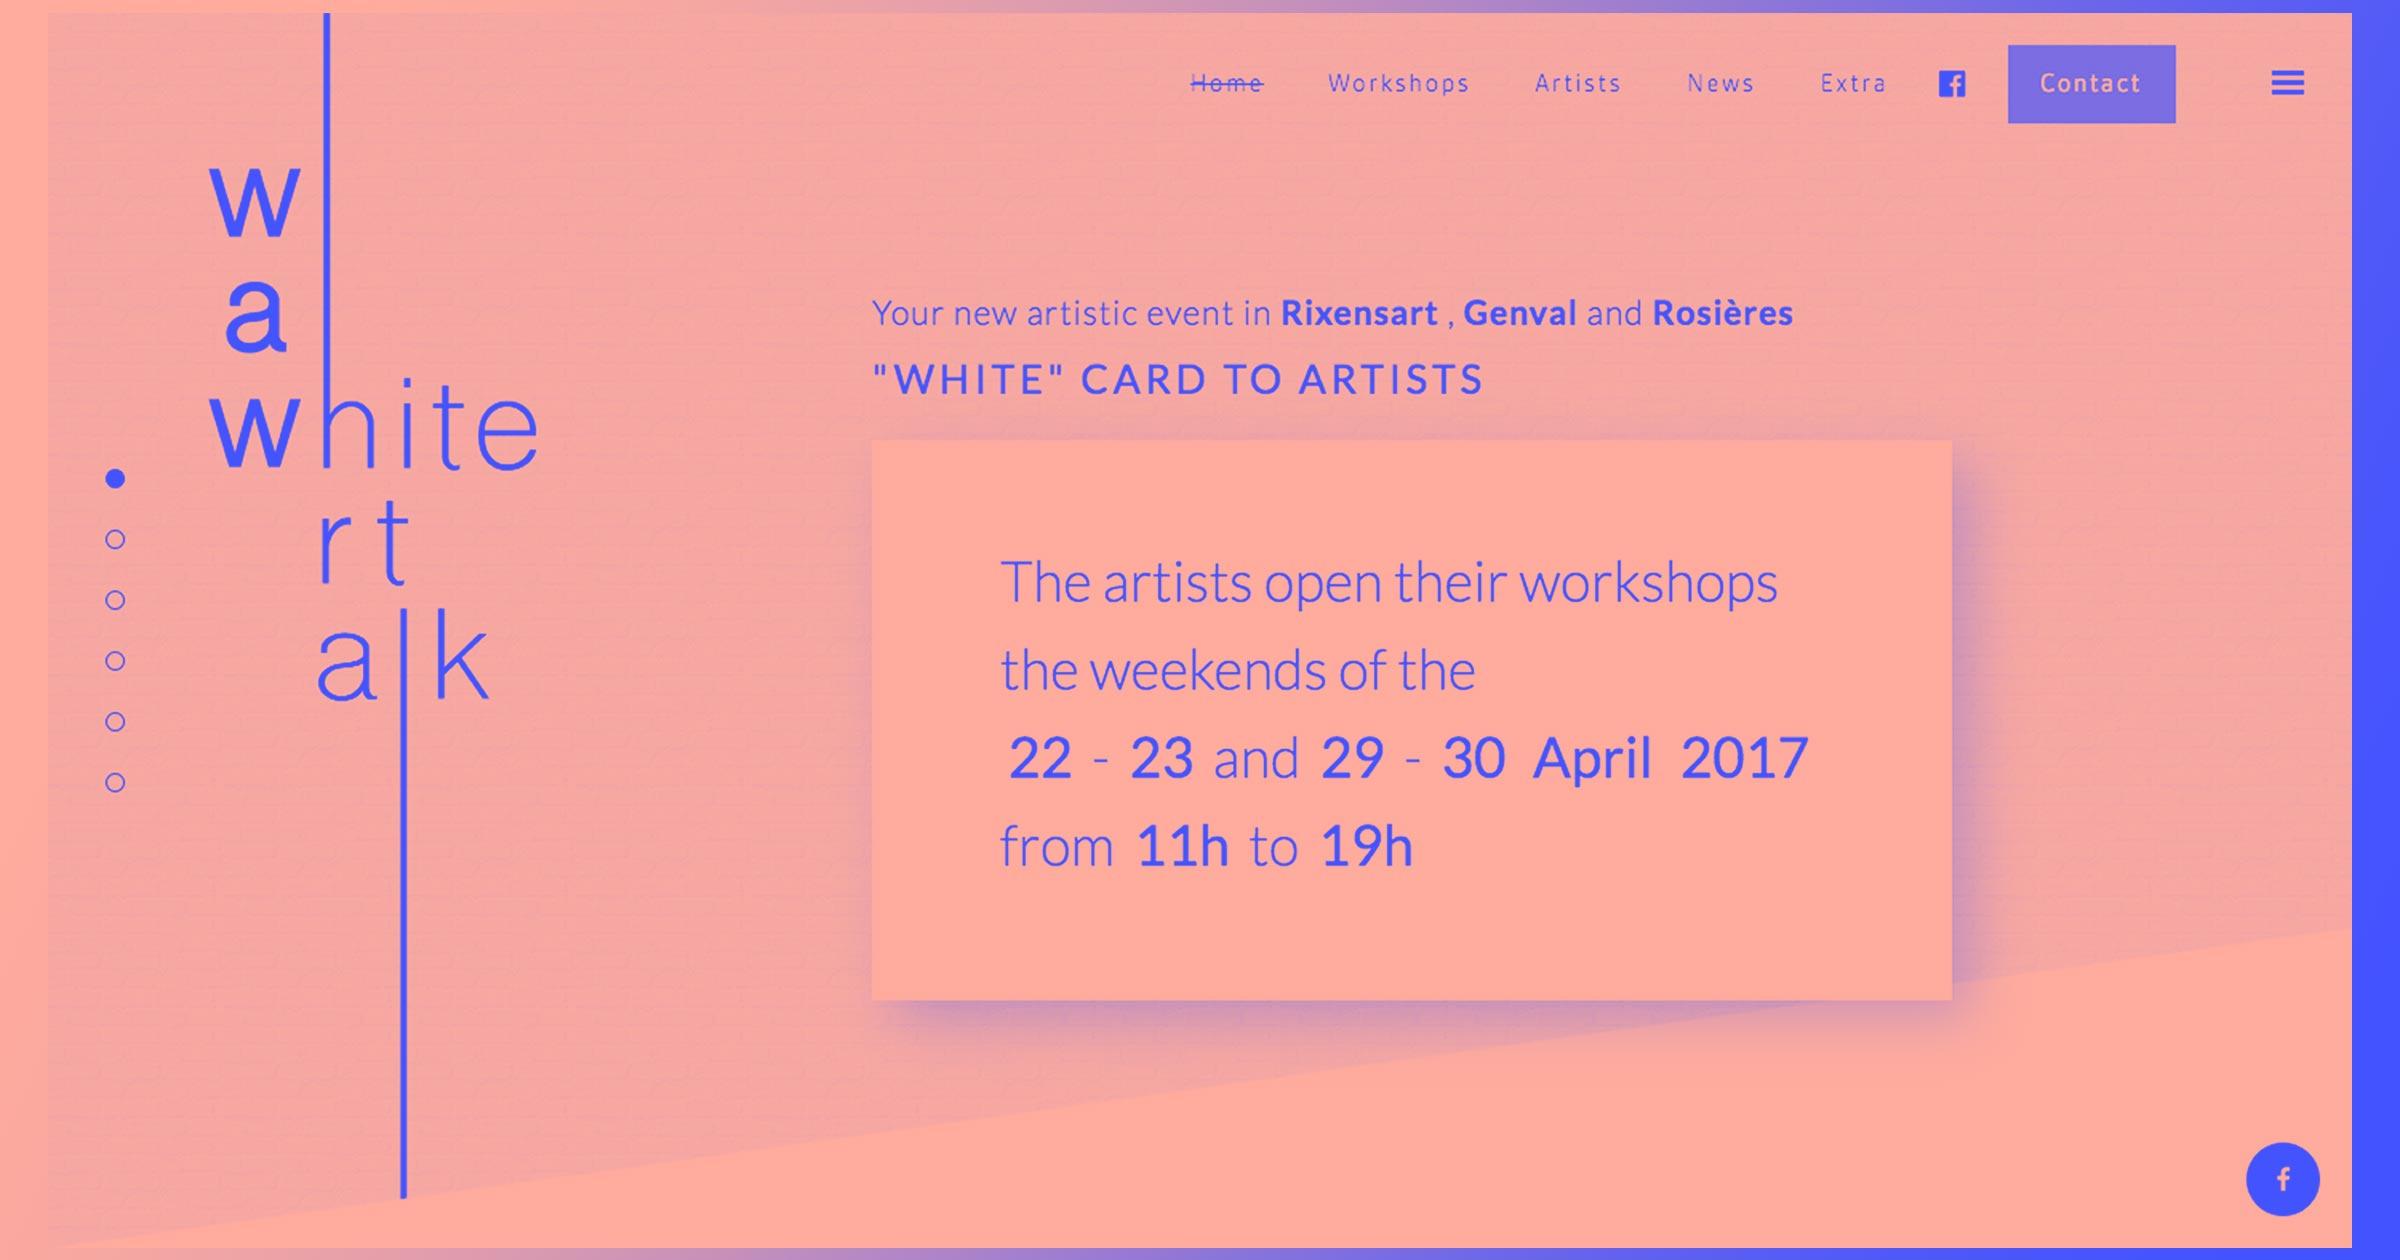 9 creative visual arts websites | Webflow Blog